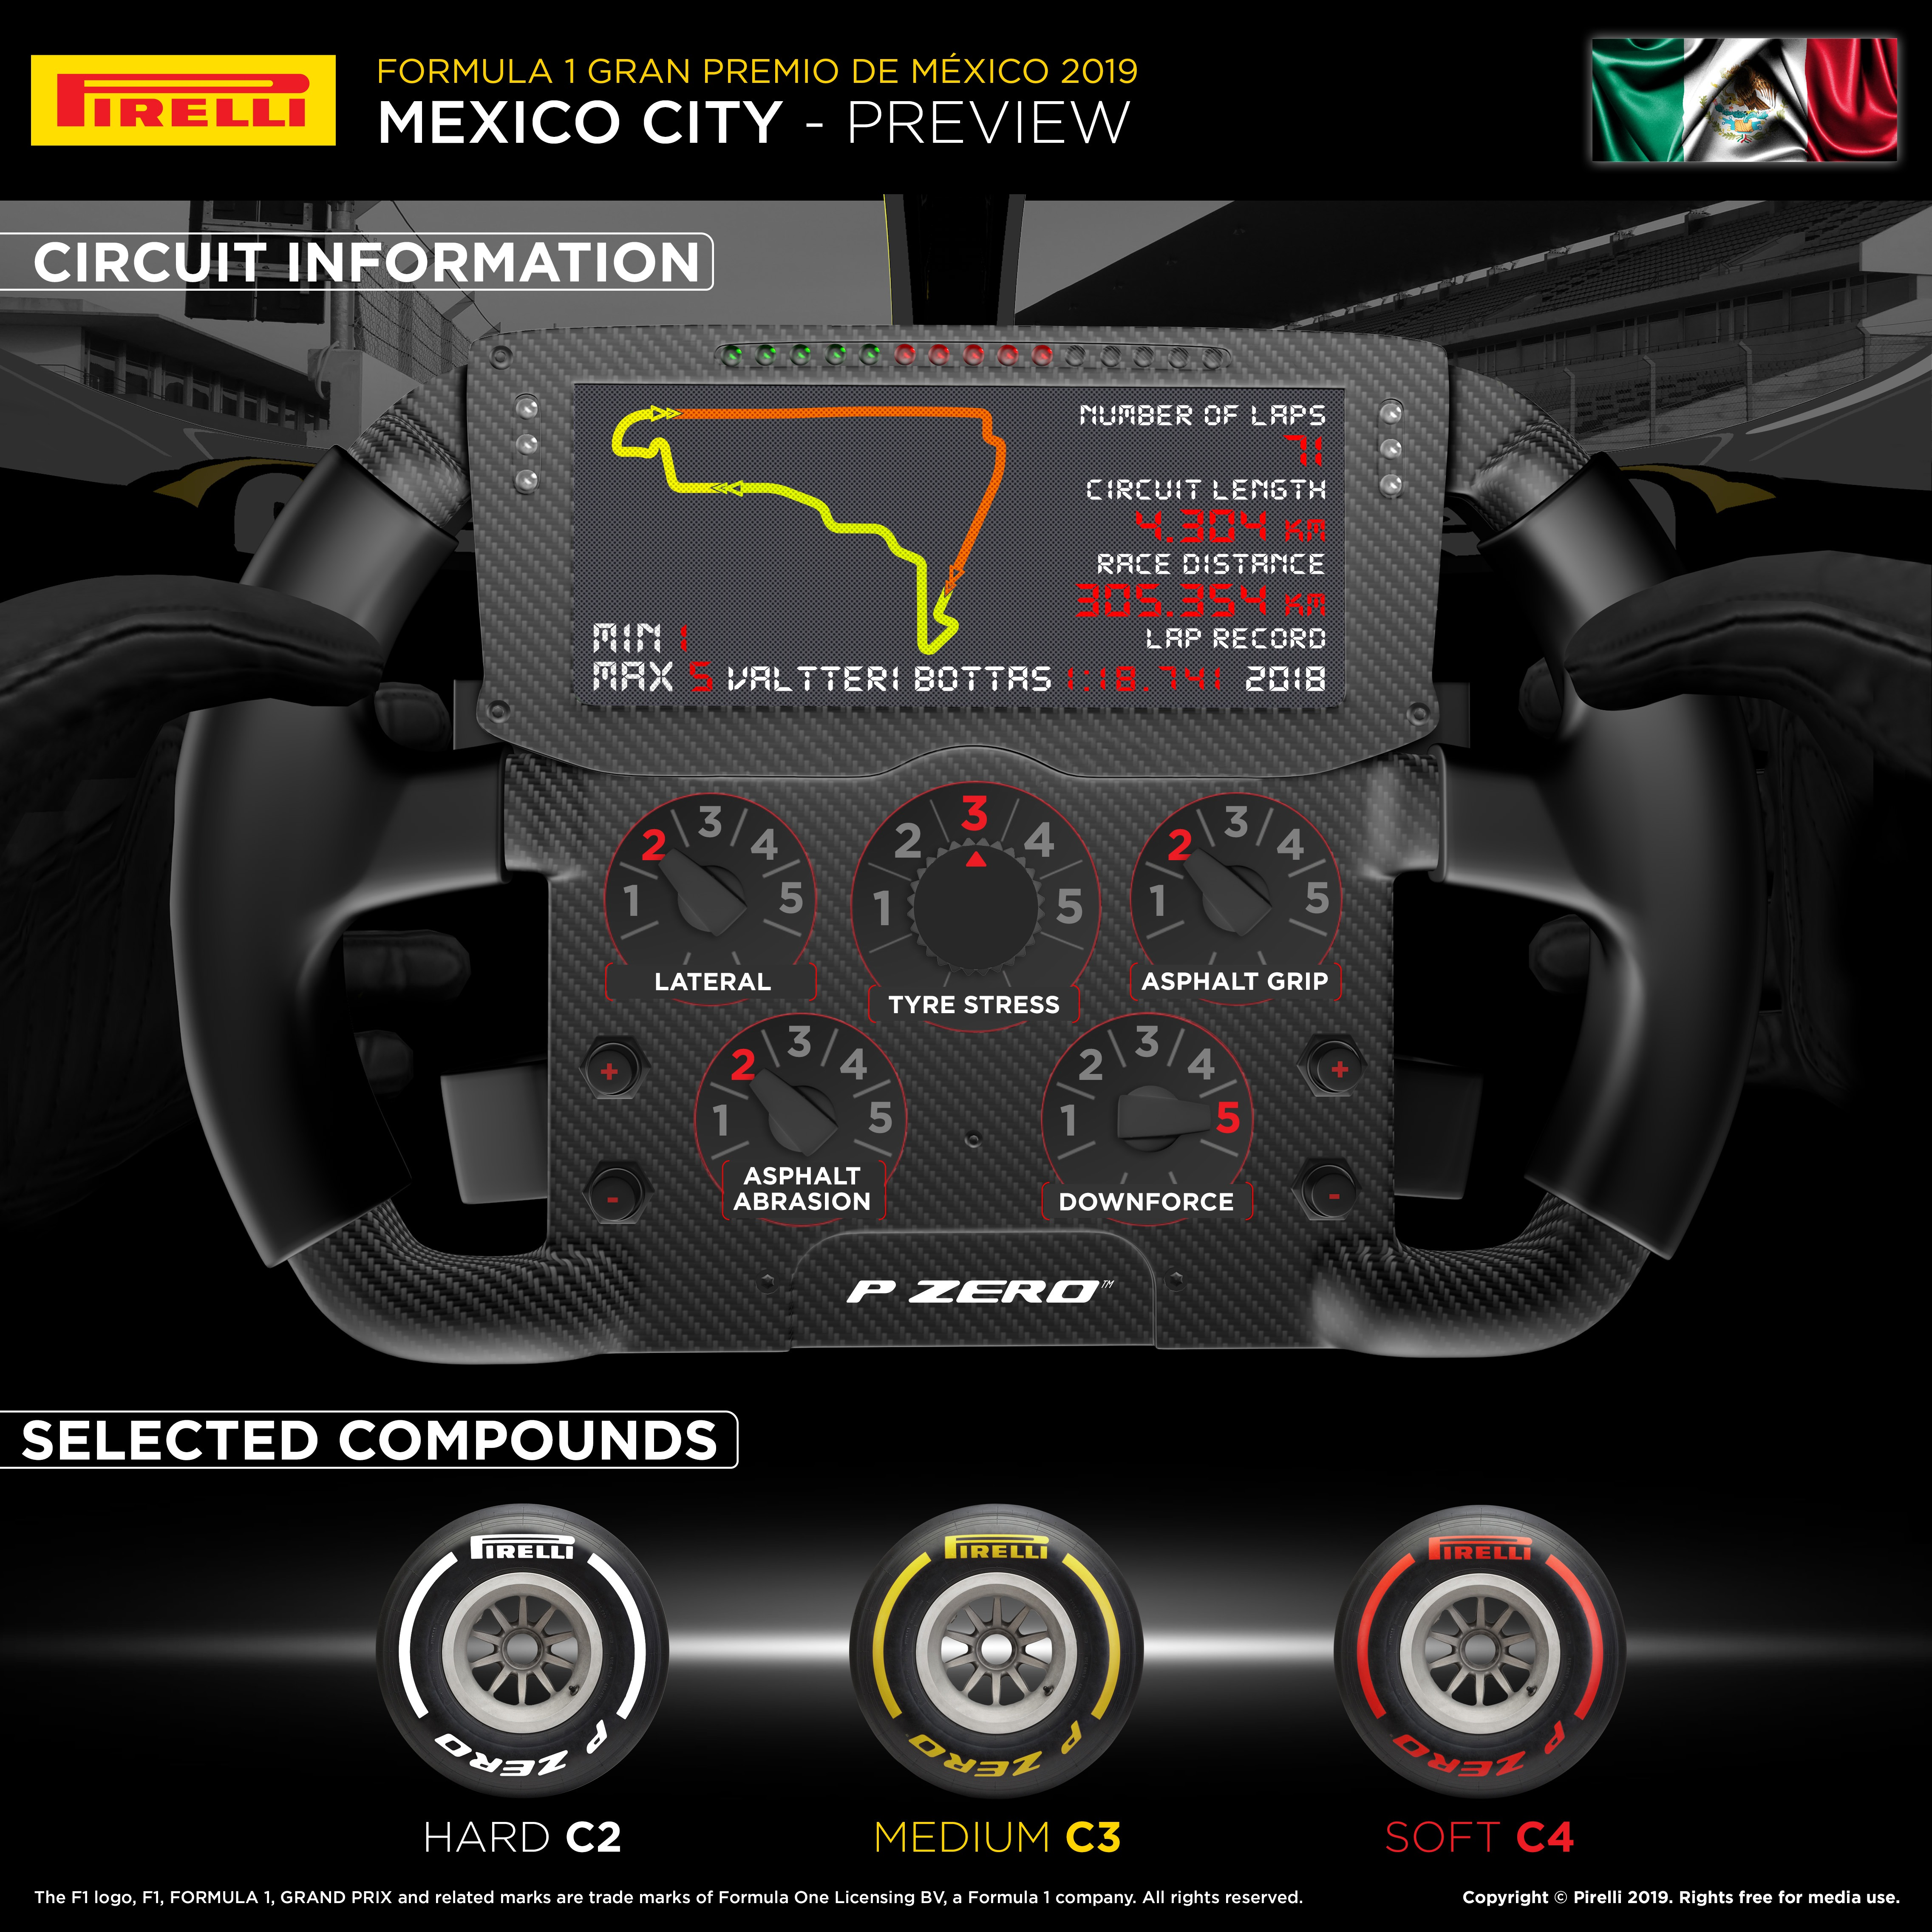 2019 Mexico F1 GP Infographic